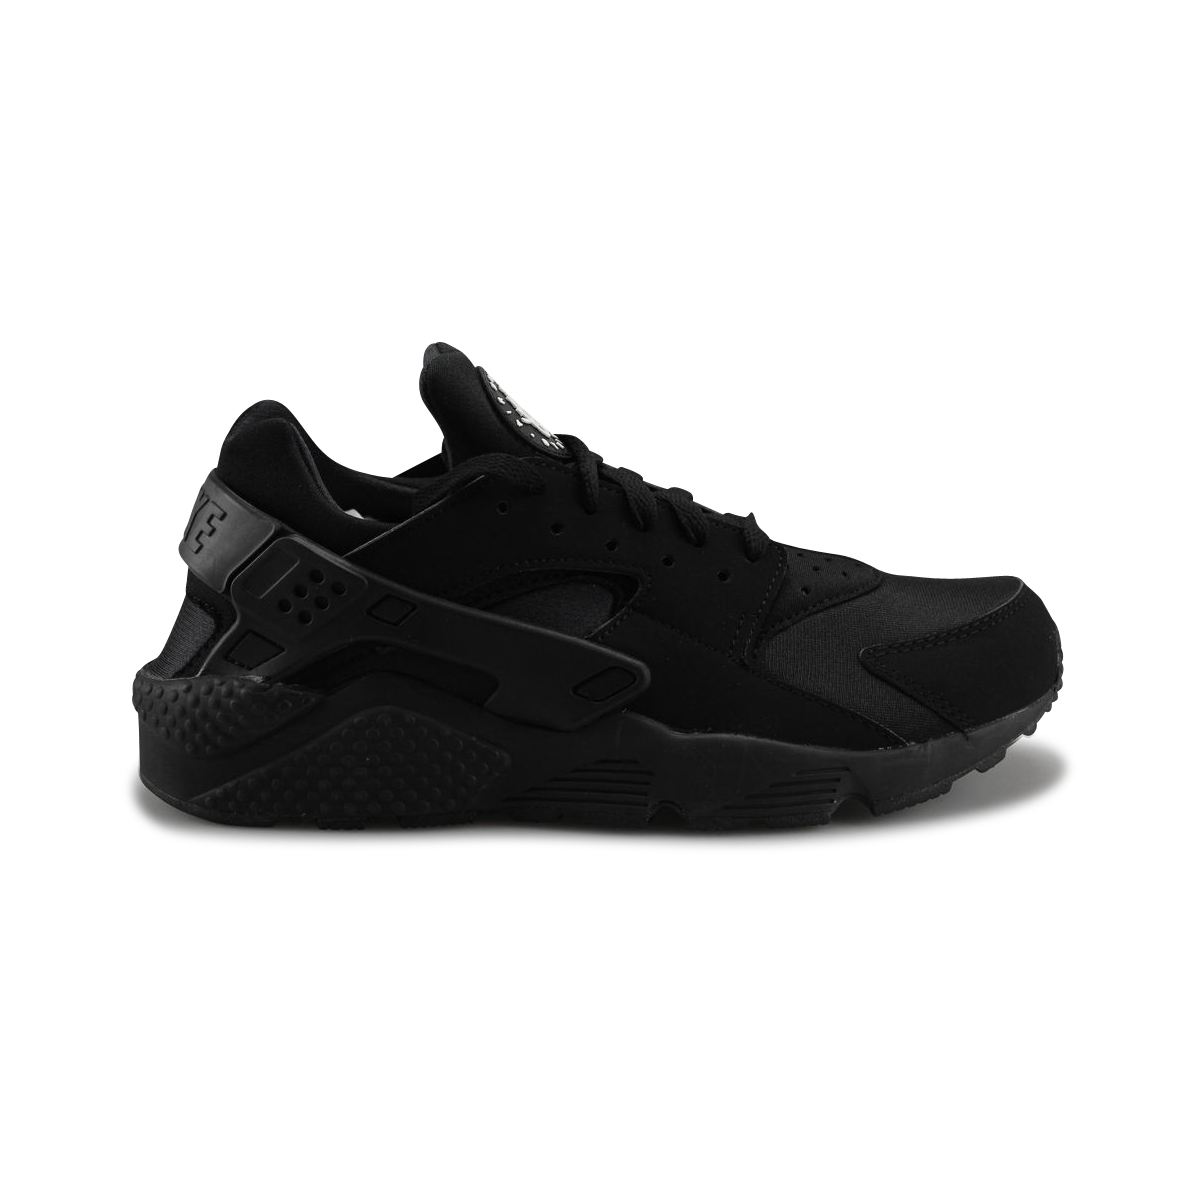 Nike 318429-003 Sneaker Homme Noir Noir - Chaussures Baskets basses Homme